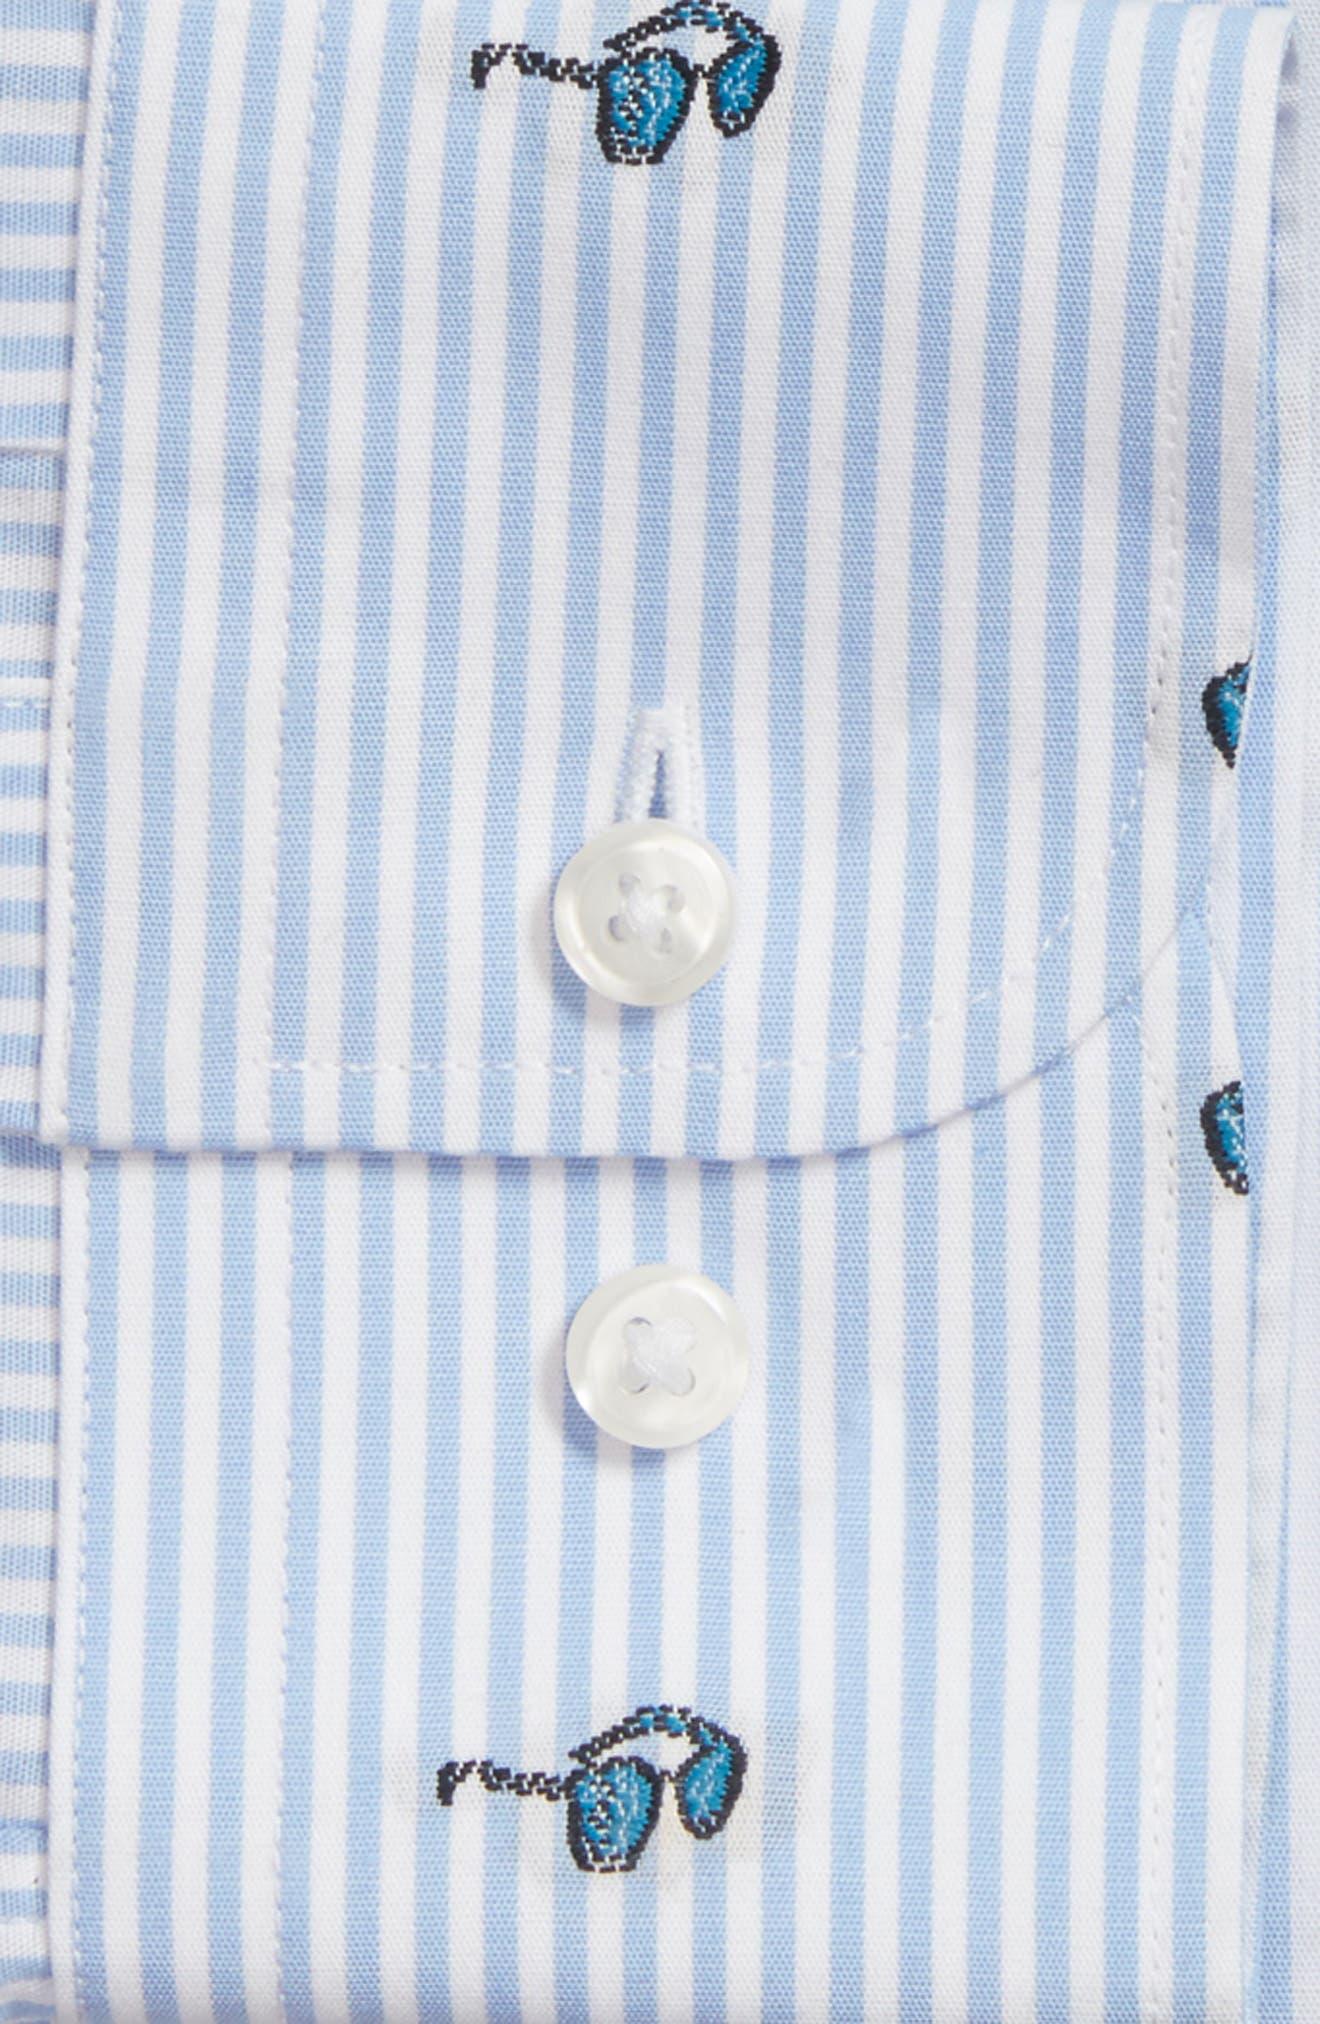 Trim Fit Sunglasses Print Dress Shirt,                             Alternate thumbnail 4, color,                             450